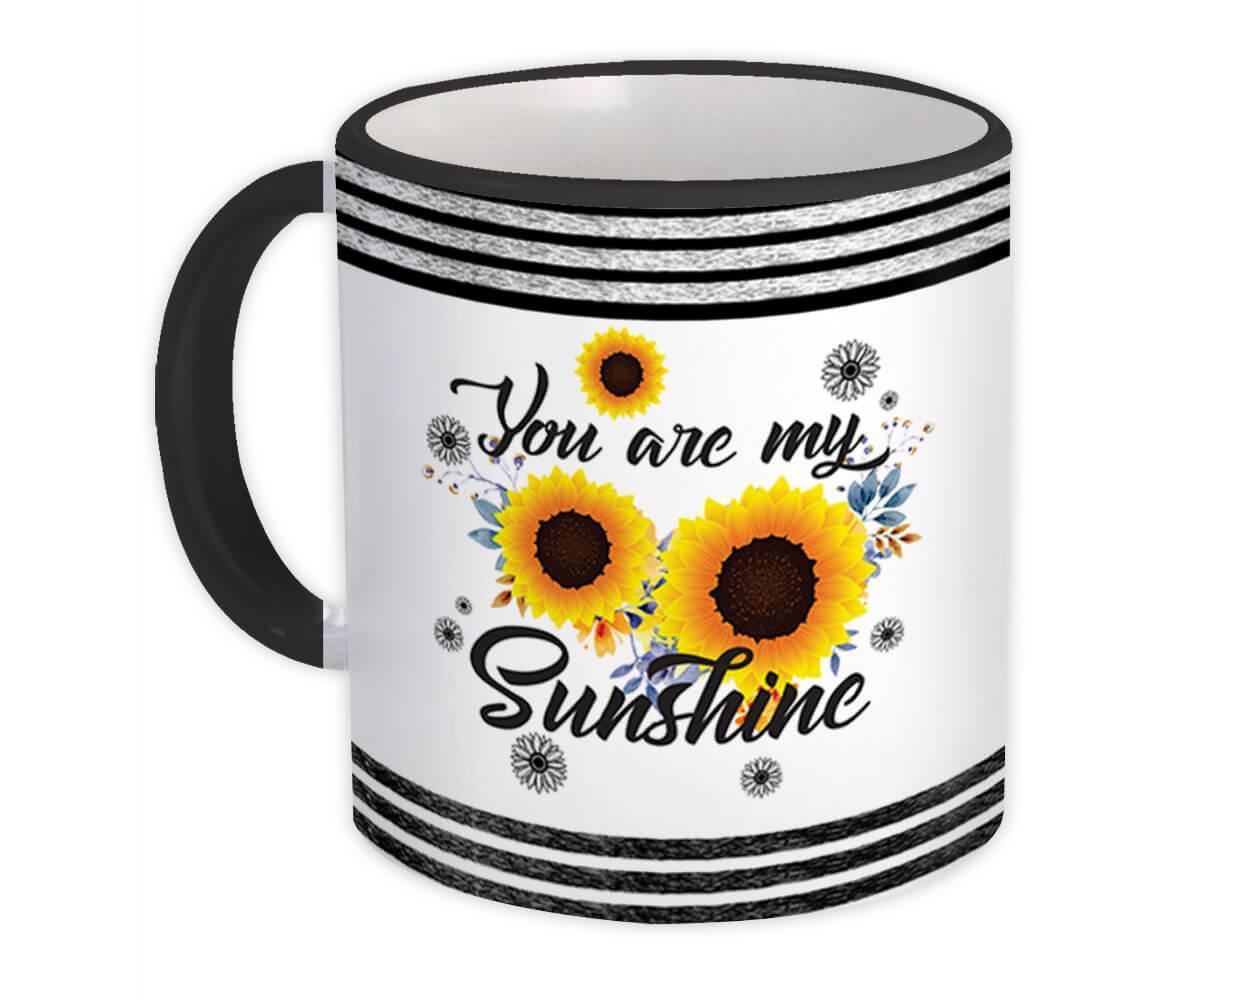 You are my sunshine : Gift Mug Sunflower Summer Love Mothers Day